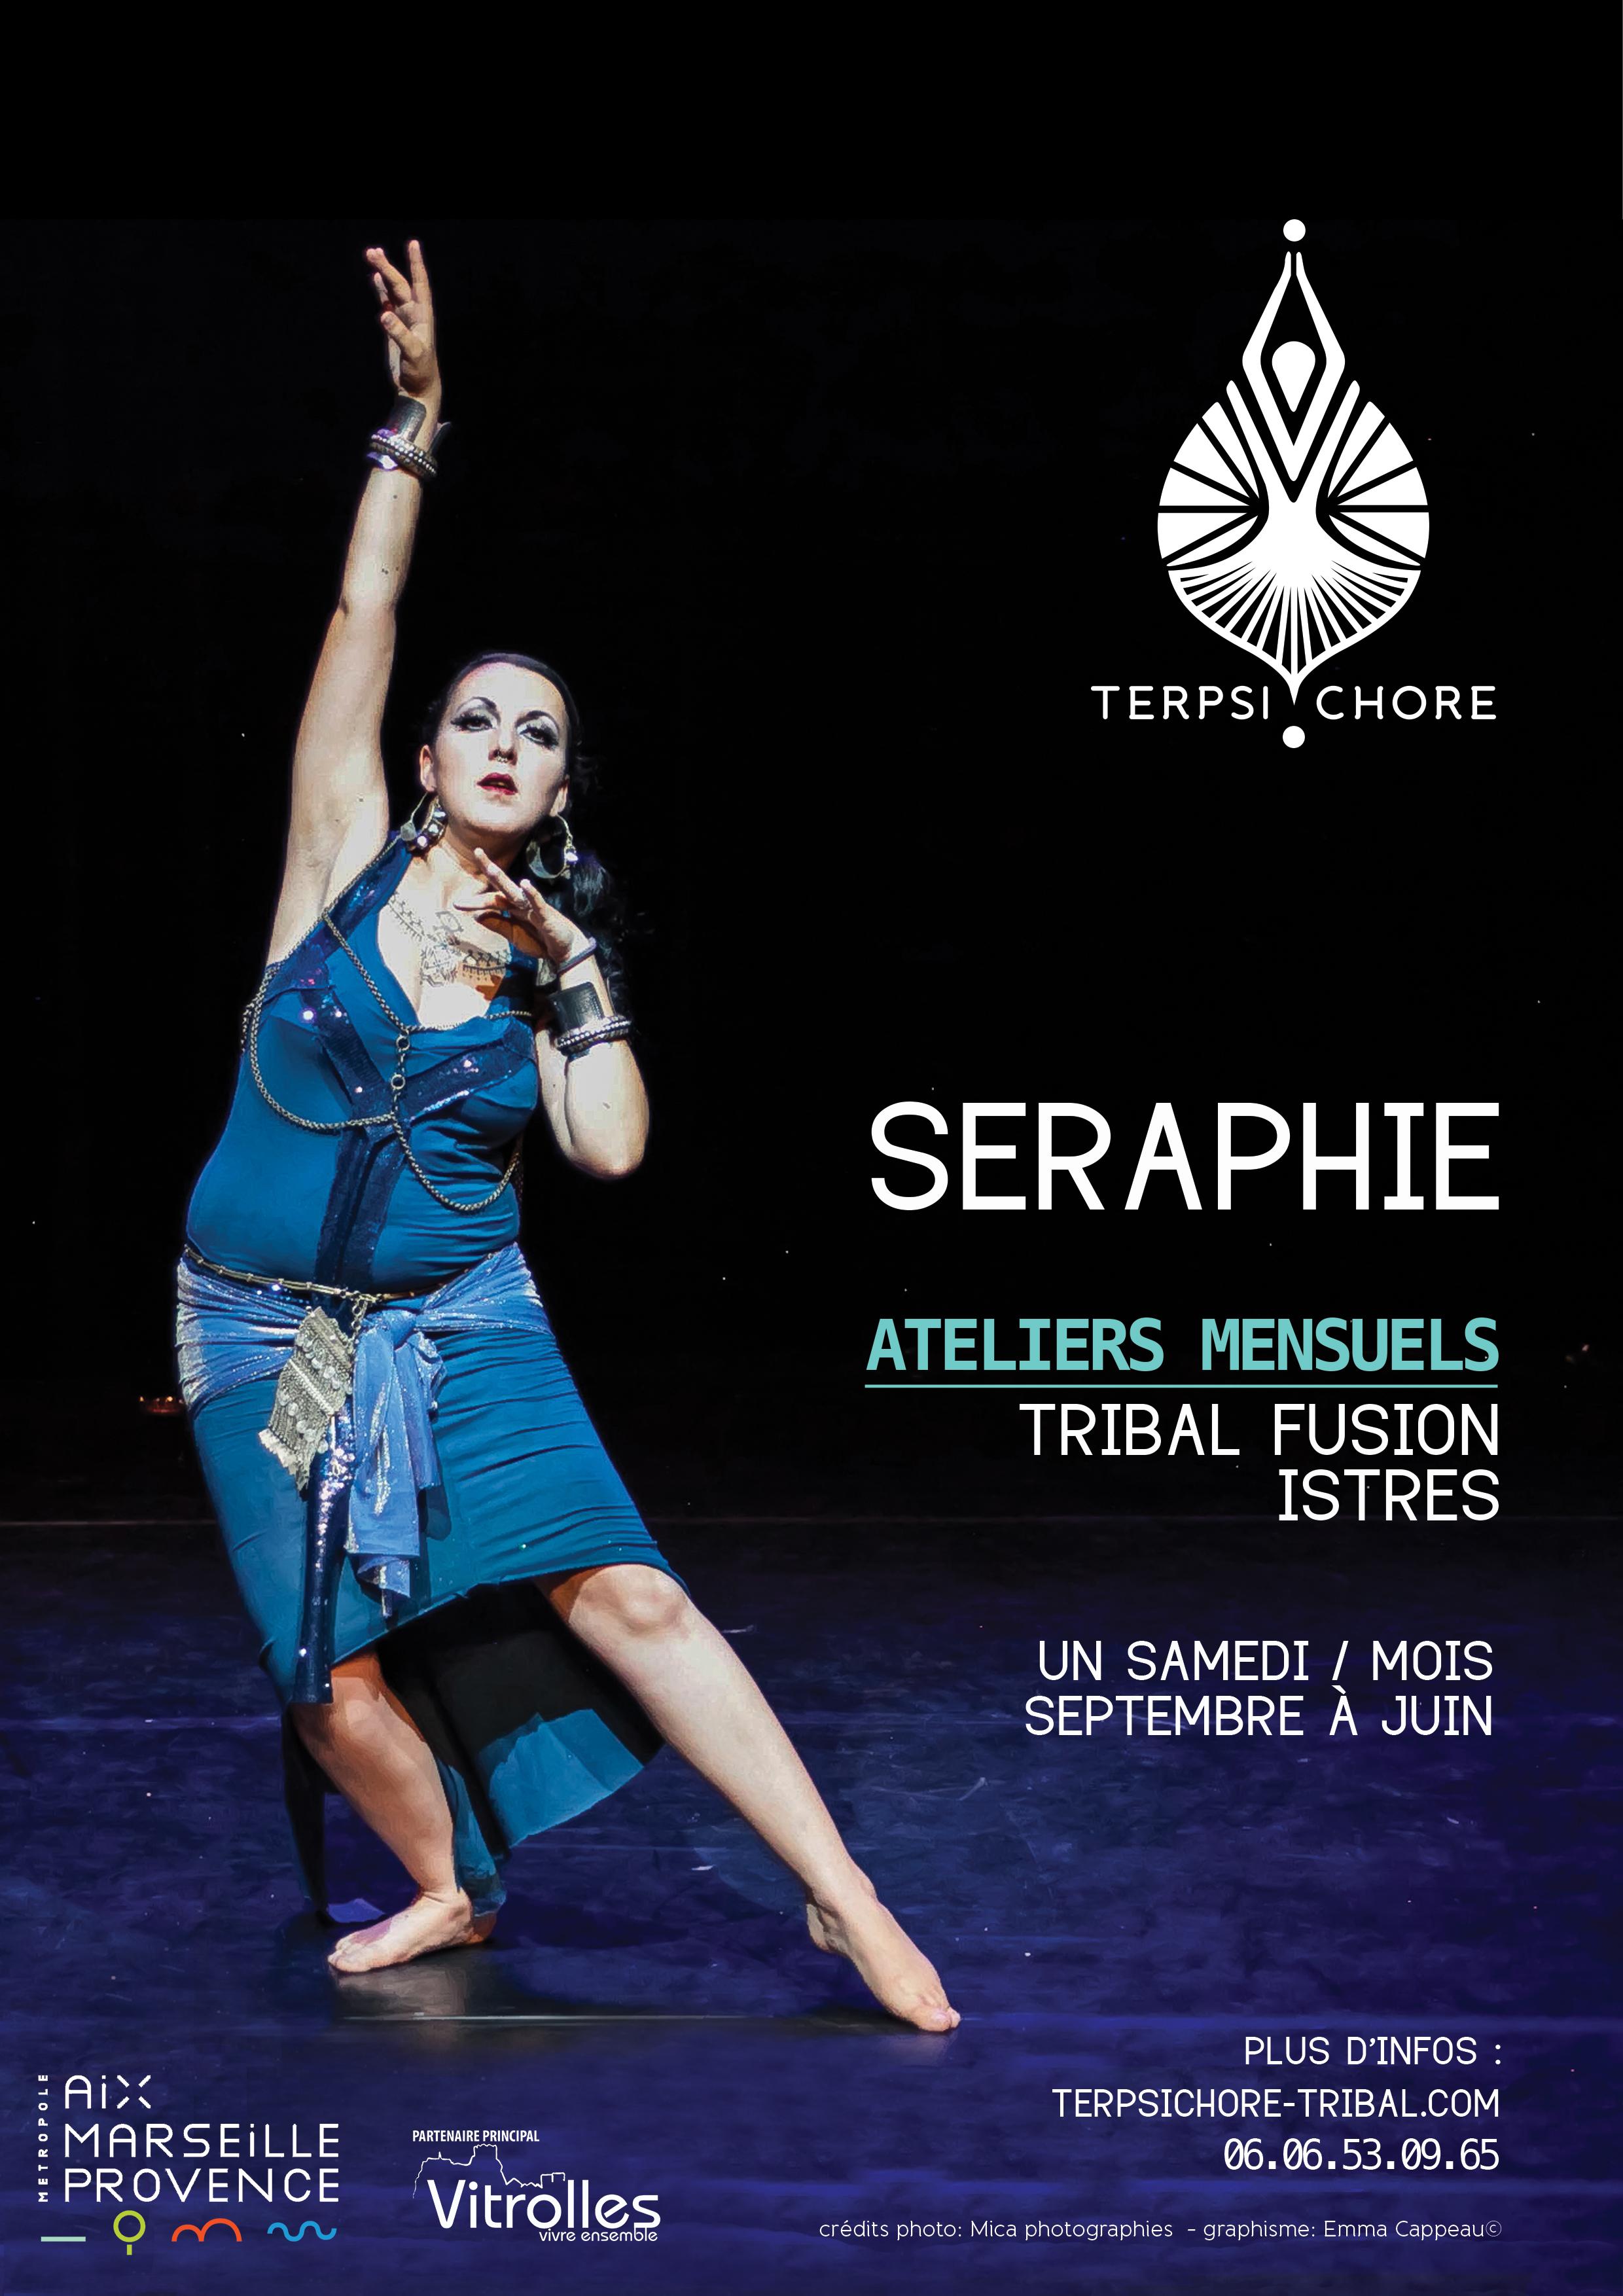 Terpsichore---Affiche-stages-Seraphie